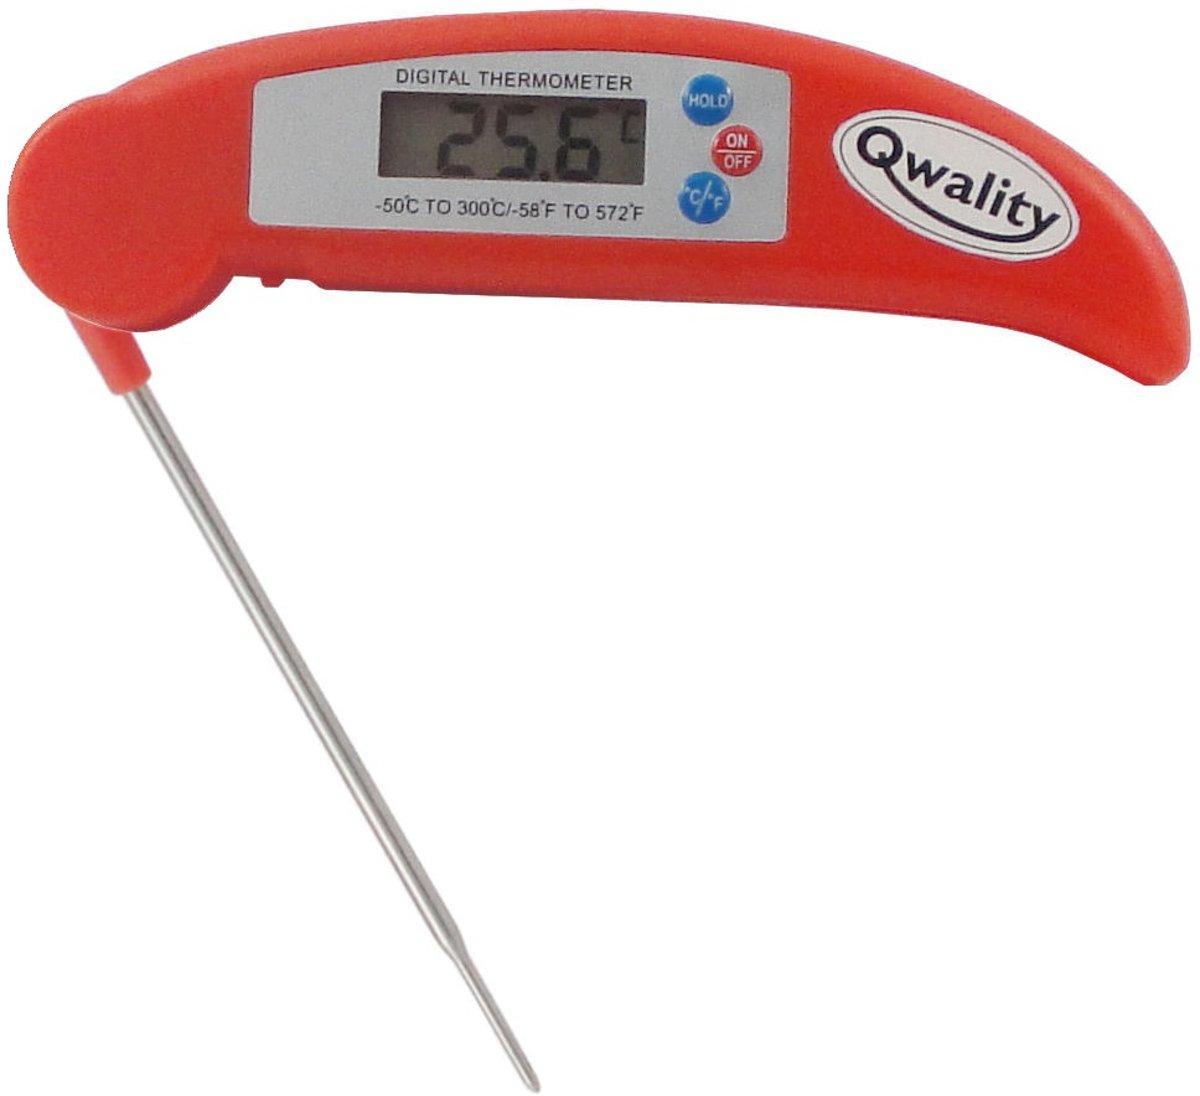 BBQ digitale kook thermometer - Vleesthermometer keuken - Inklapbaar design - Temperatuur range -50 °C tot 300°C - Qwality4u kopen